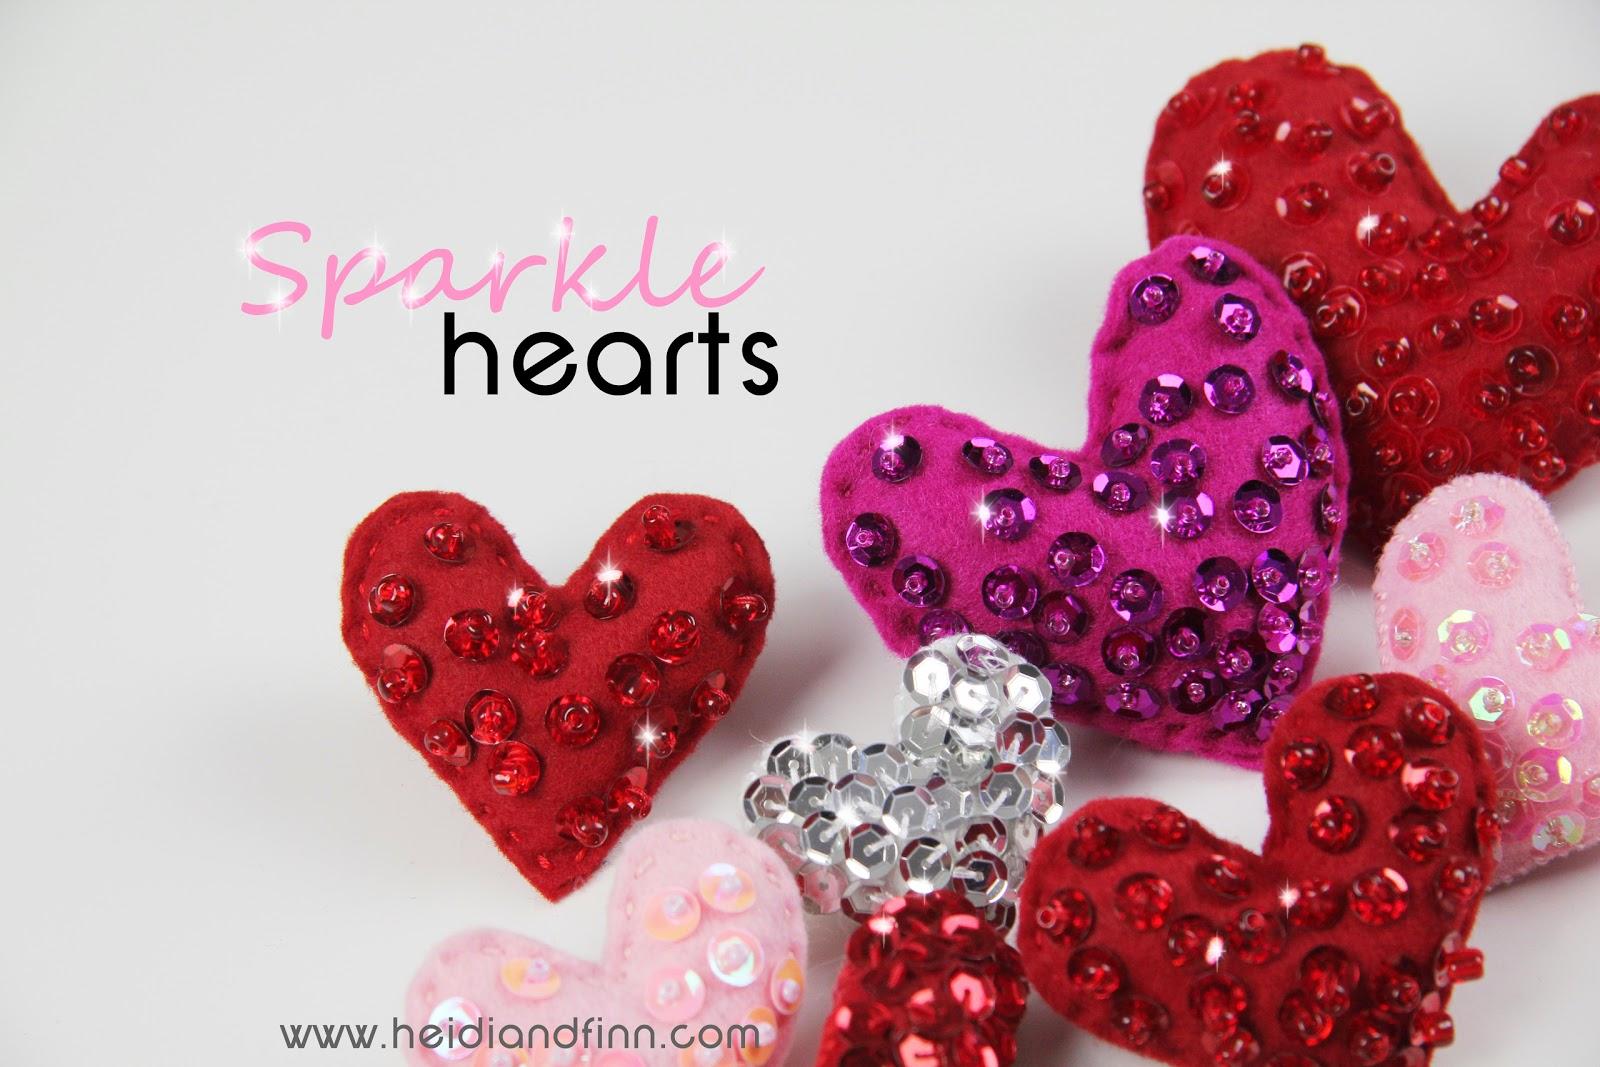 http://www.heidiandfinn.com/2014/01/valentines-sparkle-hearts-diy-tutorial.html